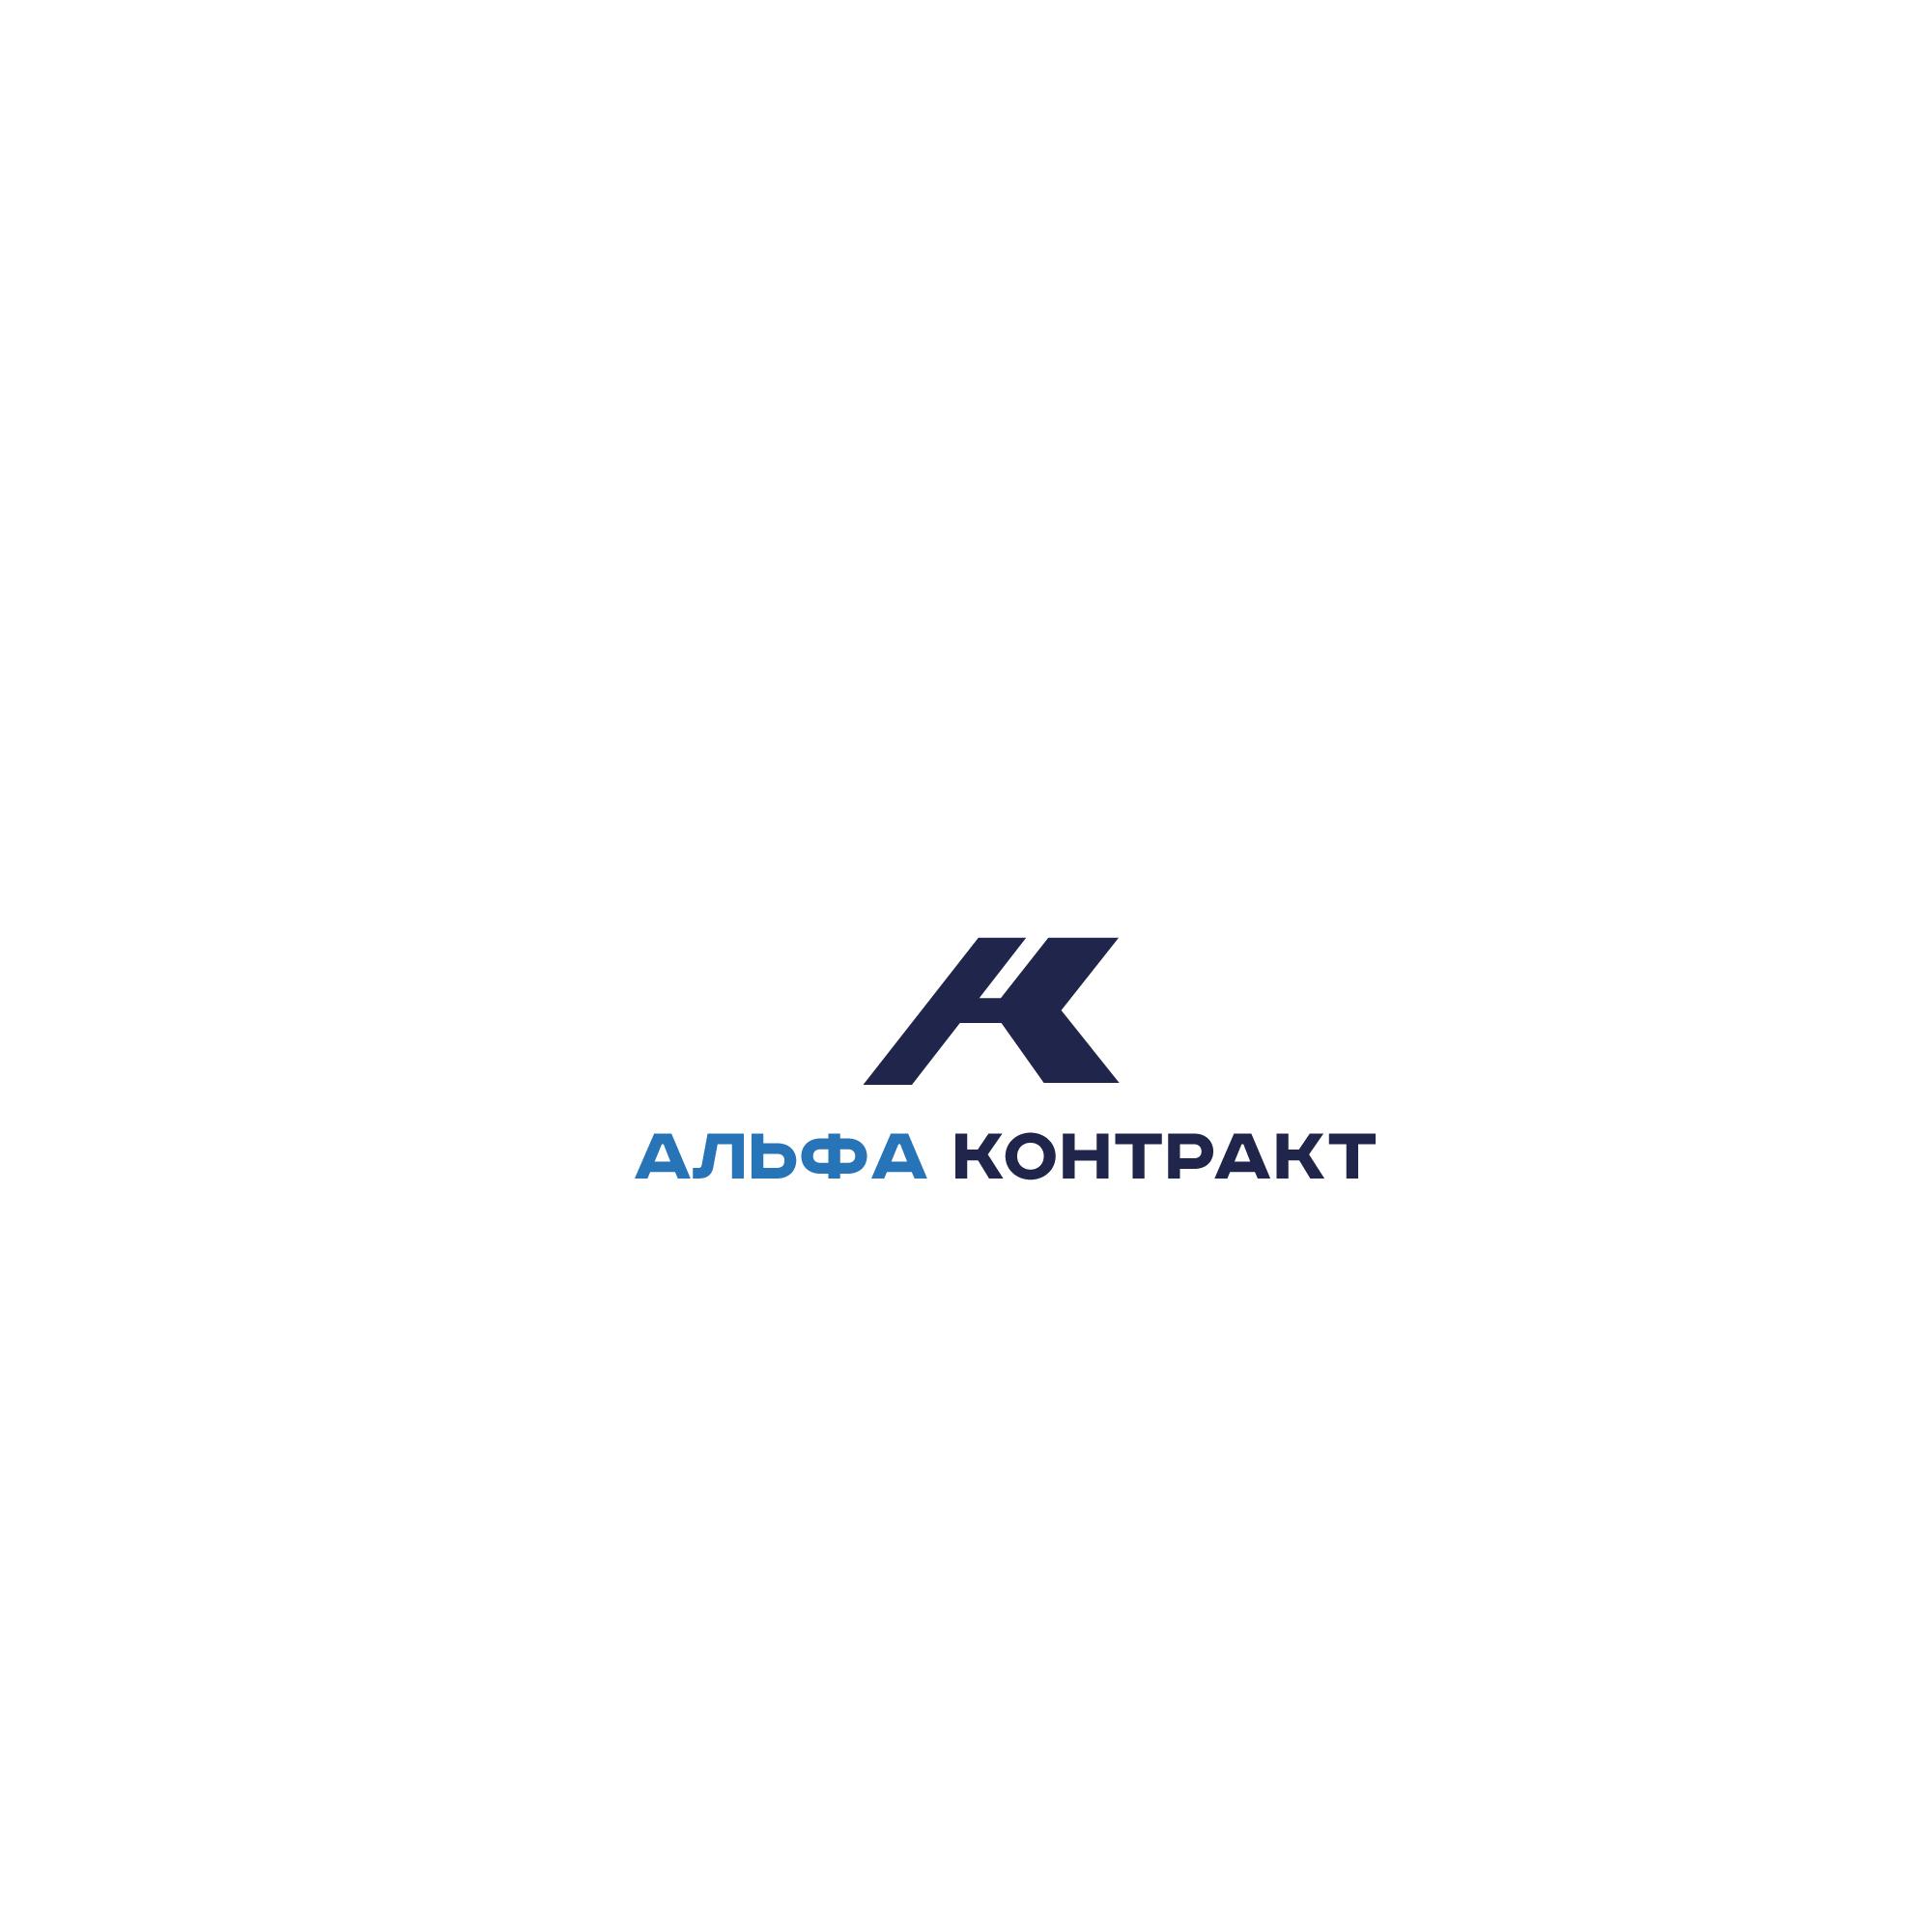 Дизайнер для разработки логотипа компании фото f_2685bfd30aa3fd6c.jpg